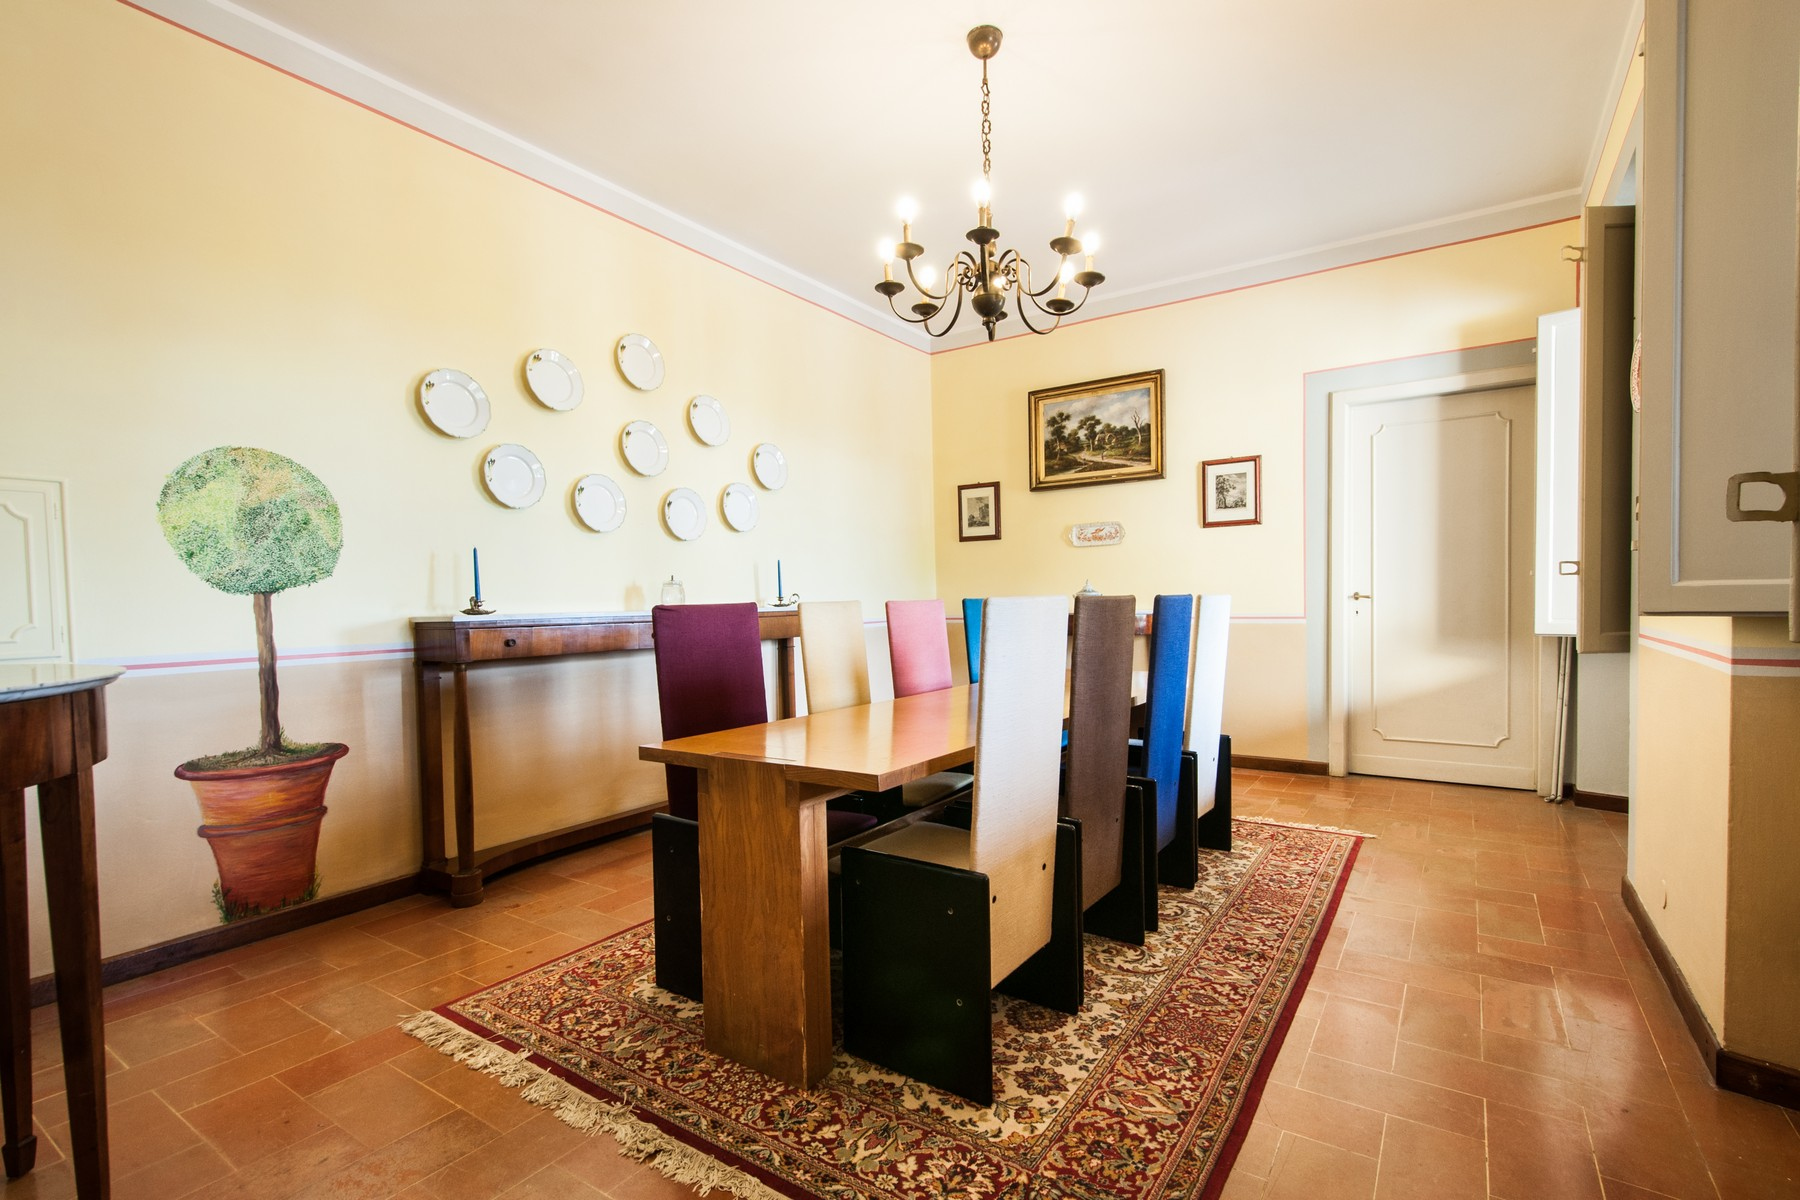 Villa in Vendita a Lucca: 5 locali, 400 mq - Foto 5